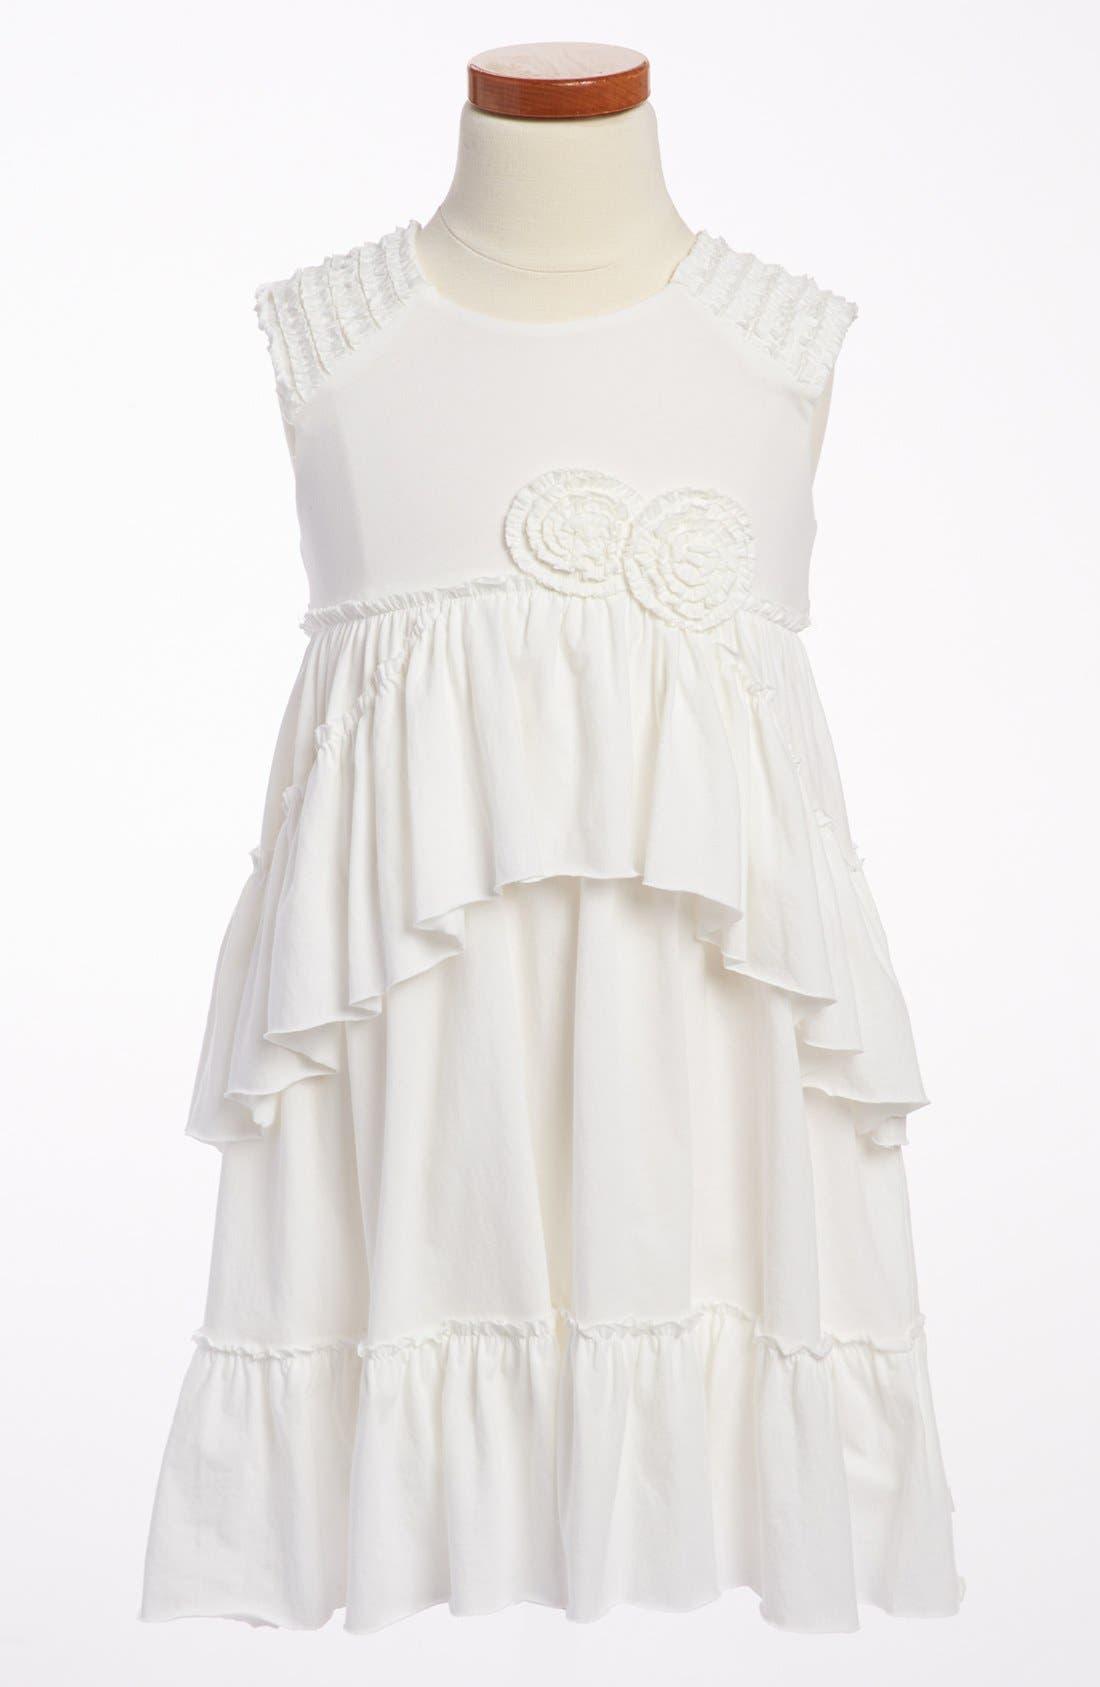 Alternate Image 1 Selected - Isobella & Chloe 'Rebecca' Ruffle Dress (Little Girls & Big Girls)